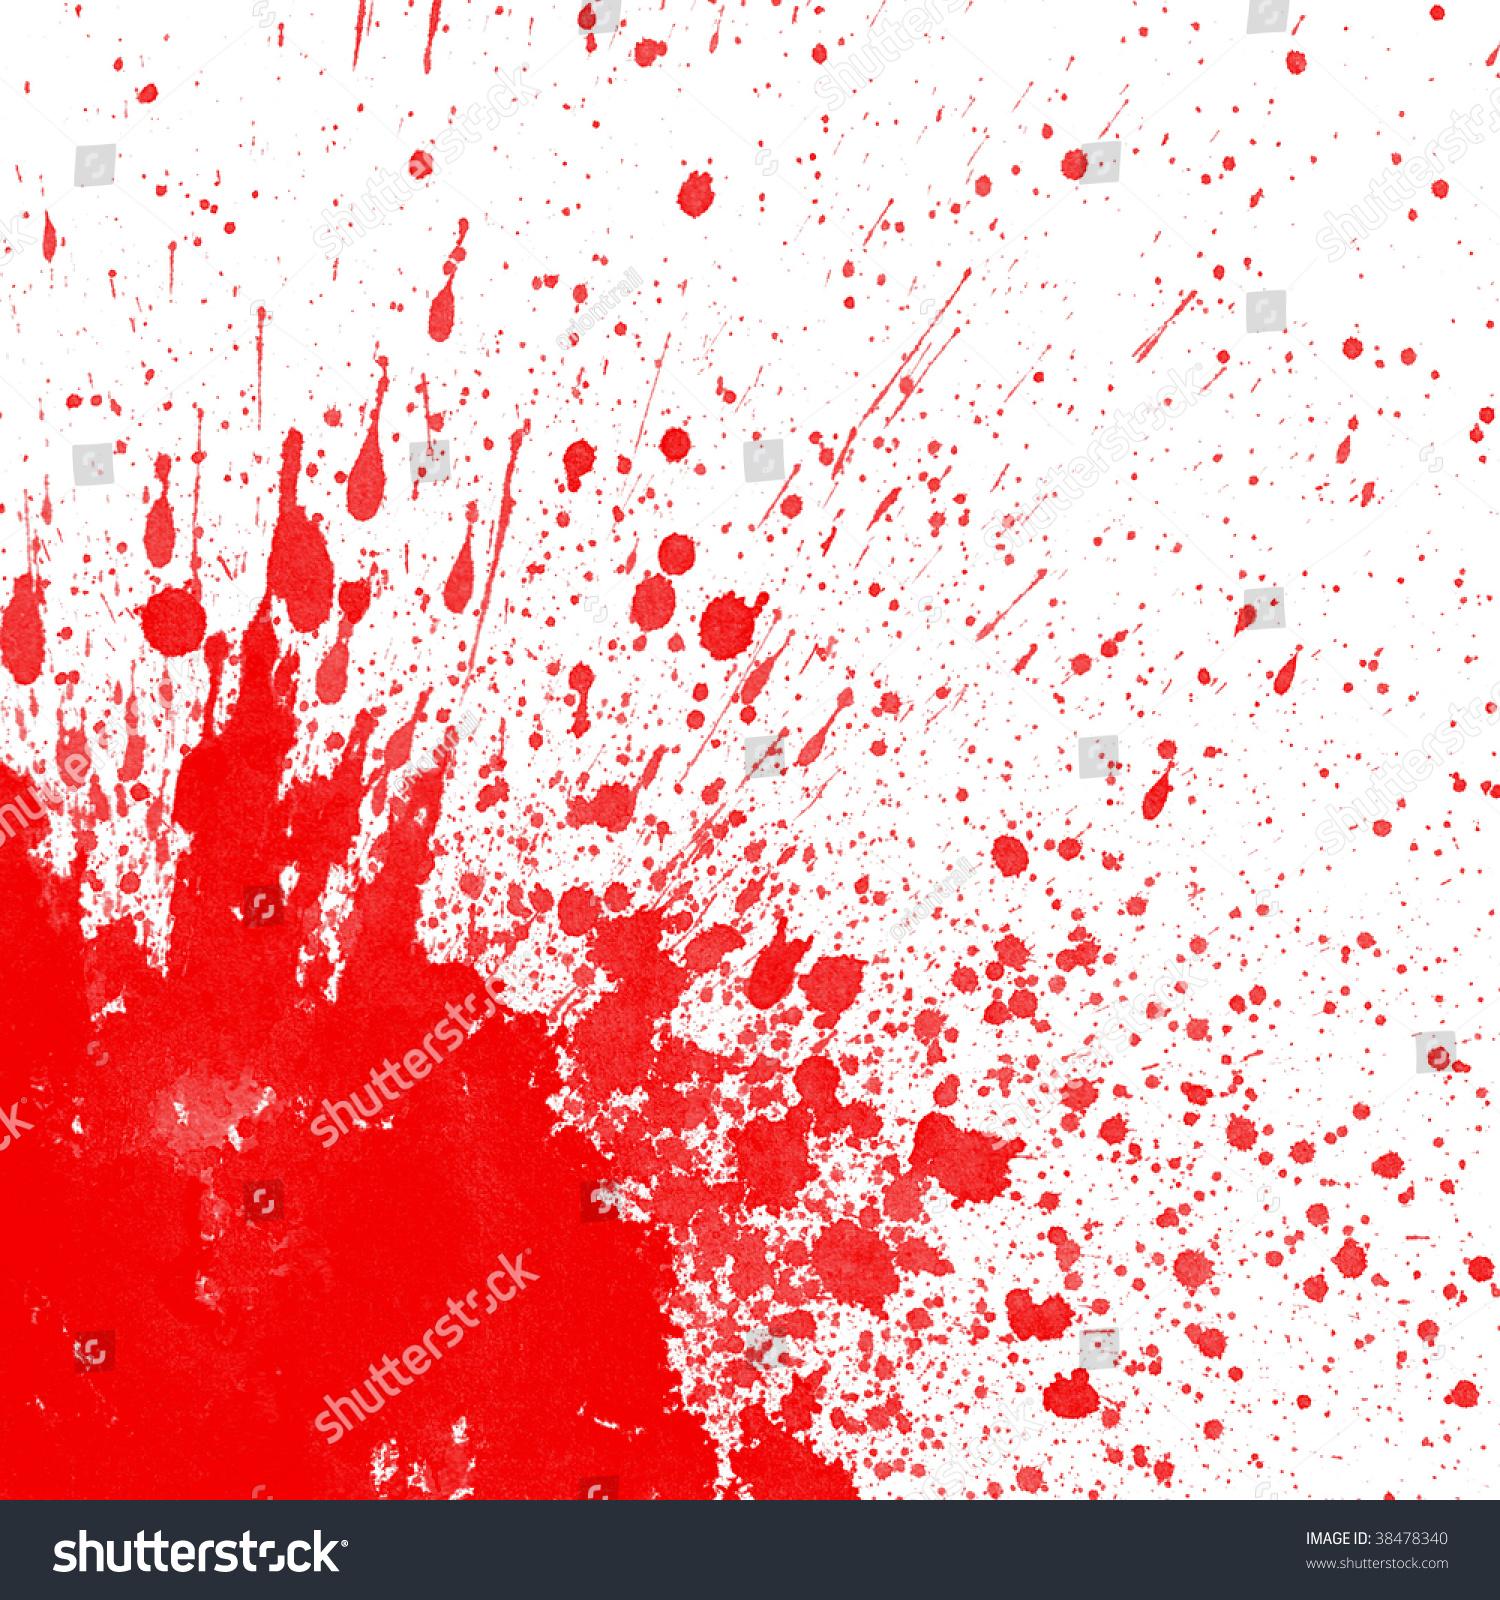 Grunge Stain Collection: Blood Splatter Corner Image Stock Illustration 38478340